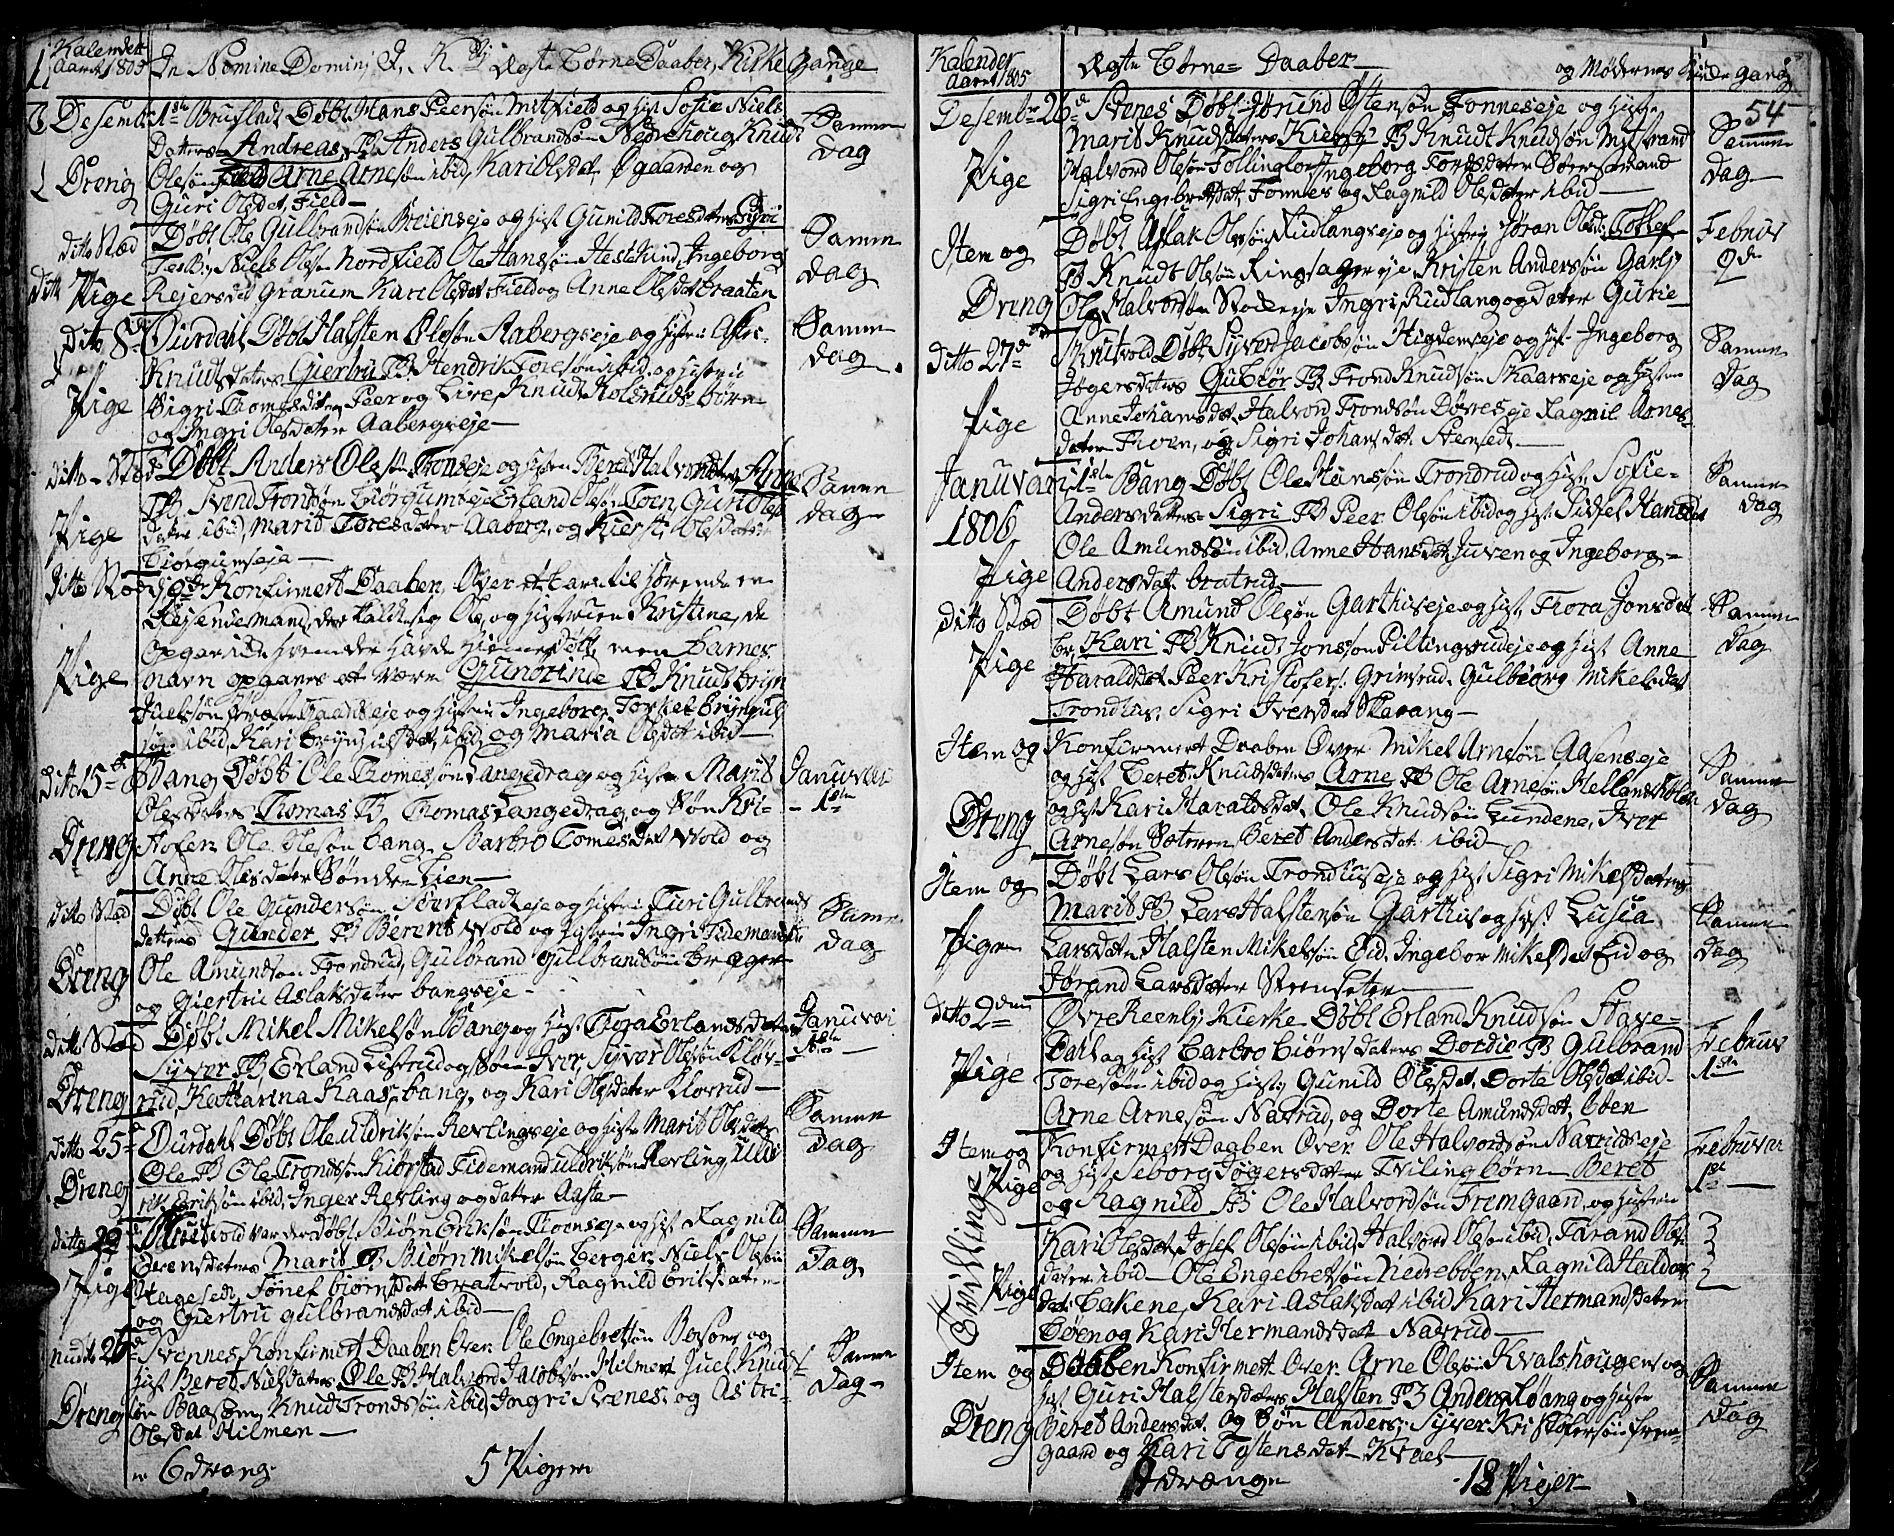 SAH, Aurdal prestekontor, Ministerialbok nr. 7, 1800-1808, s. 54